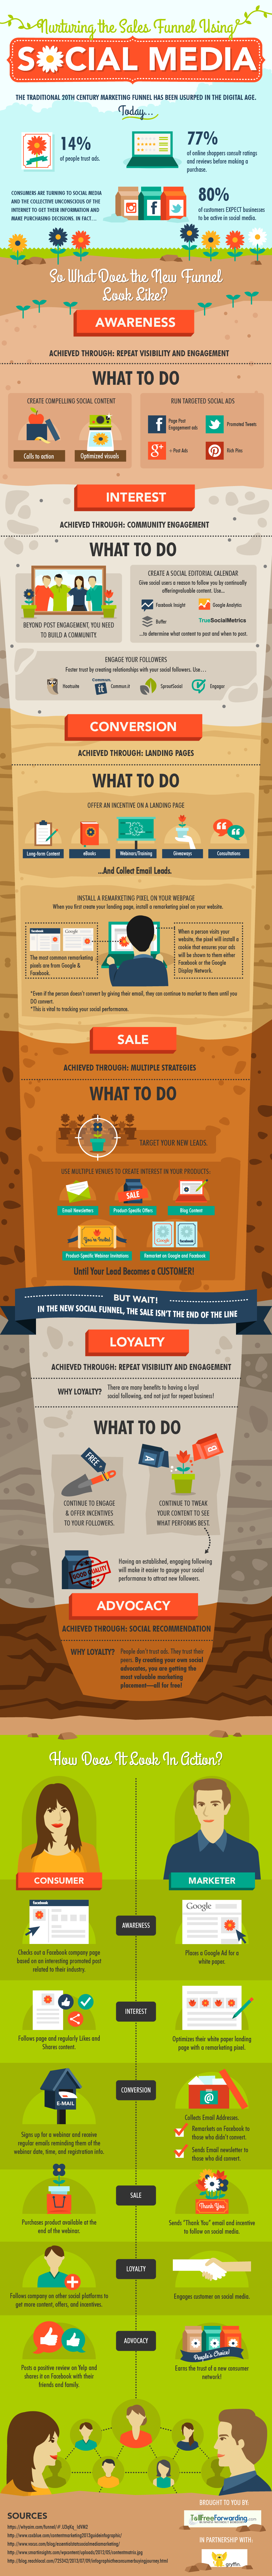 social media marketing branding and sales